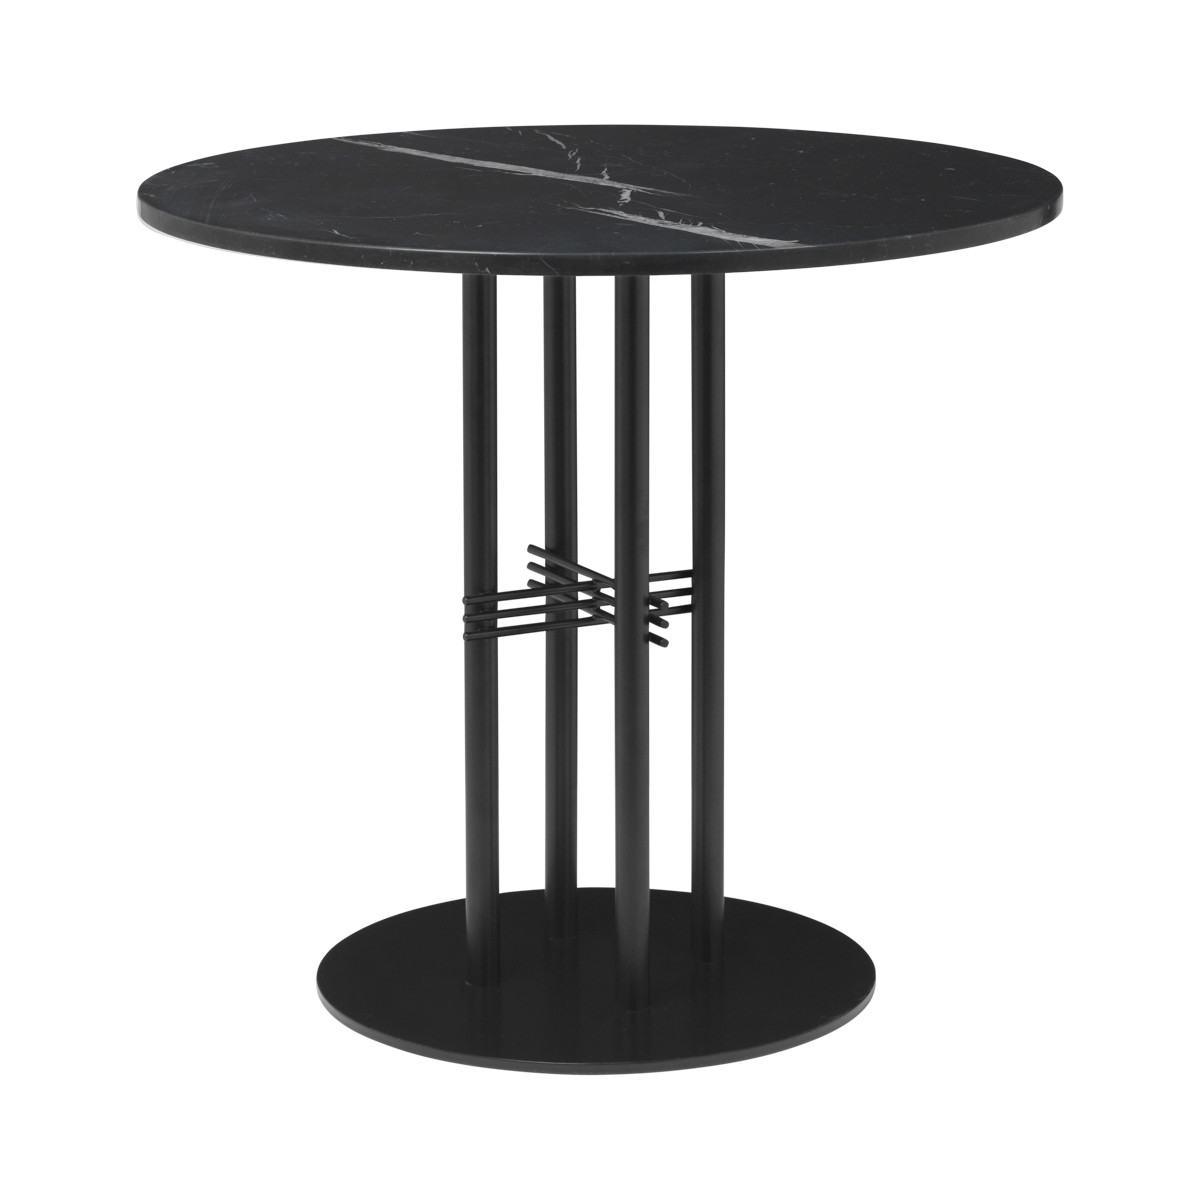 Gubi Ts Column Dining Table - Round